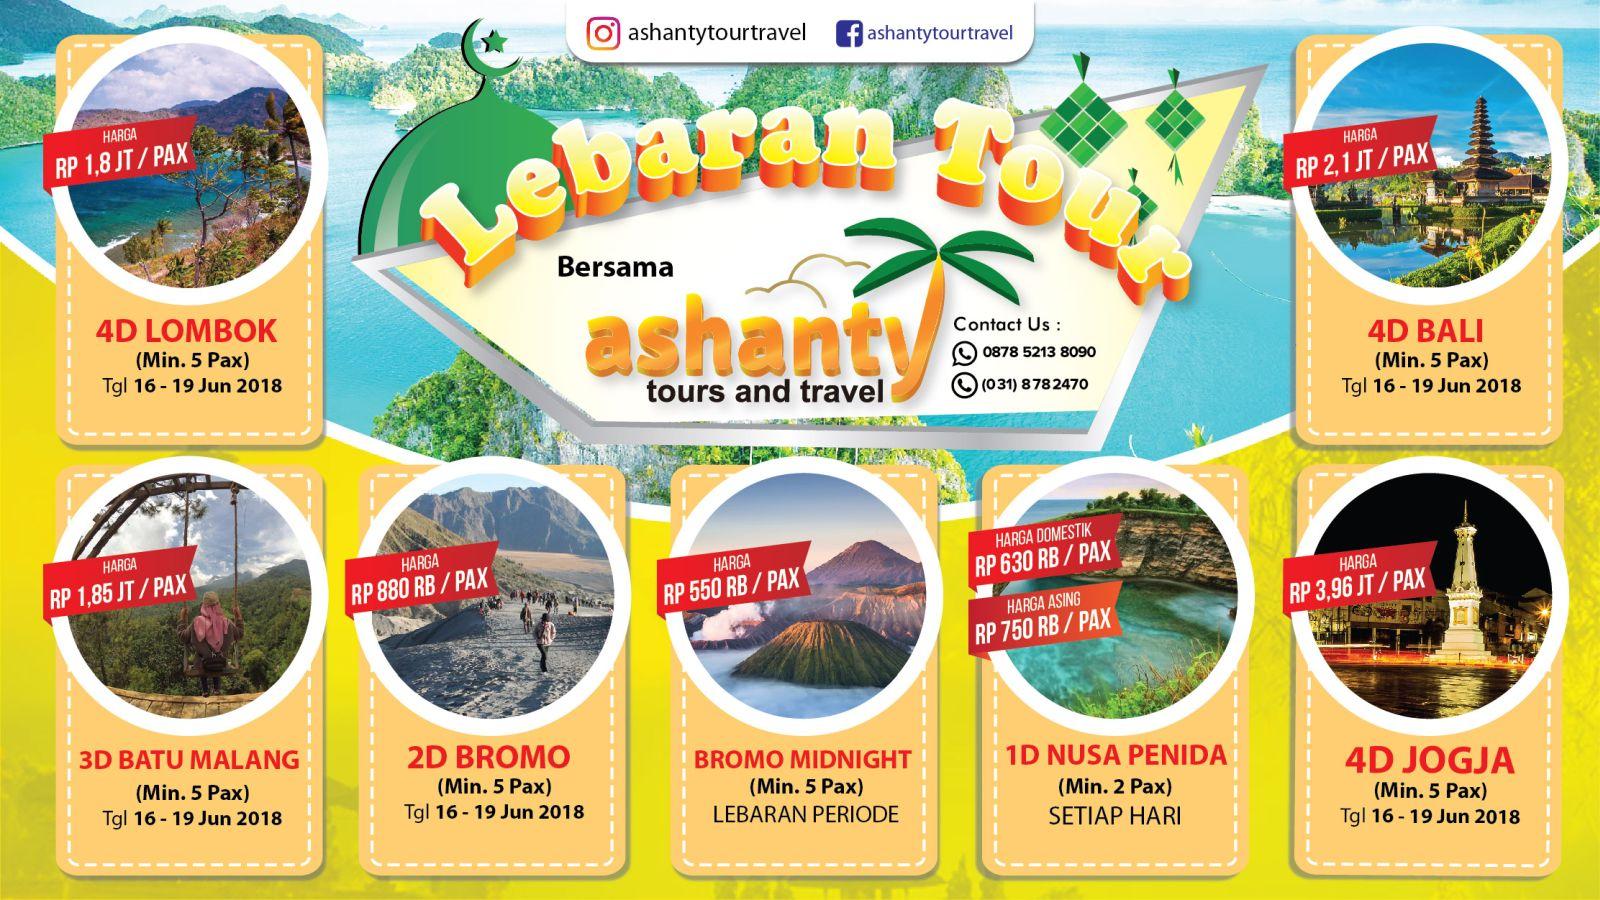 promo lebaran tour 2018 dari surabaya